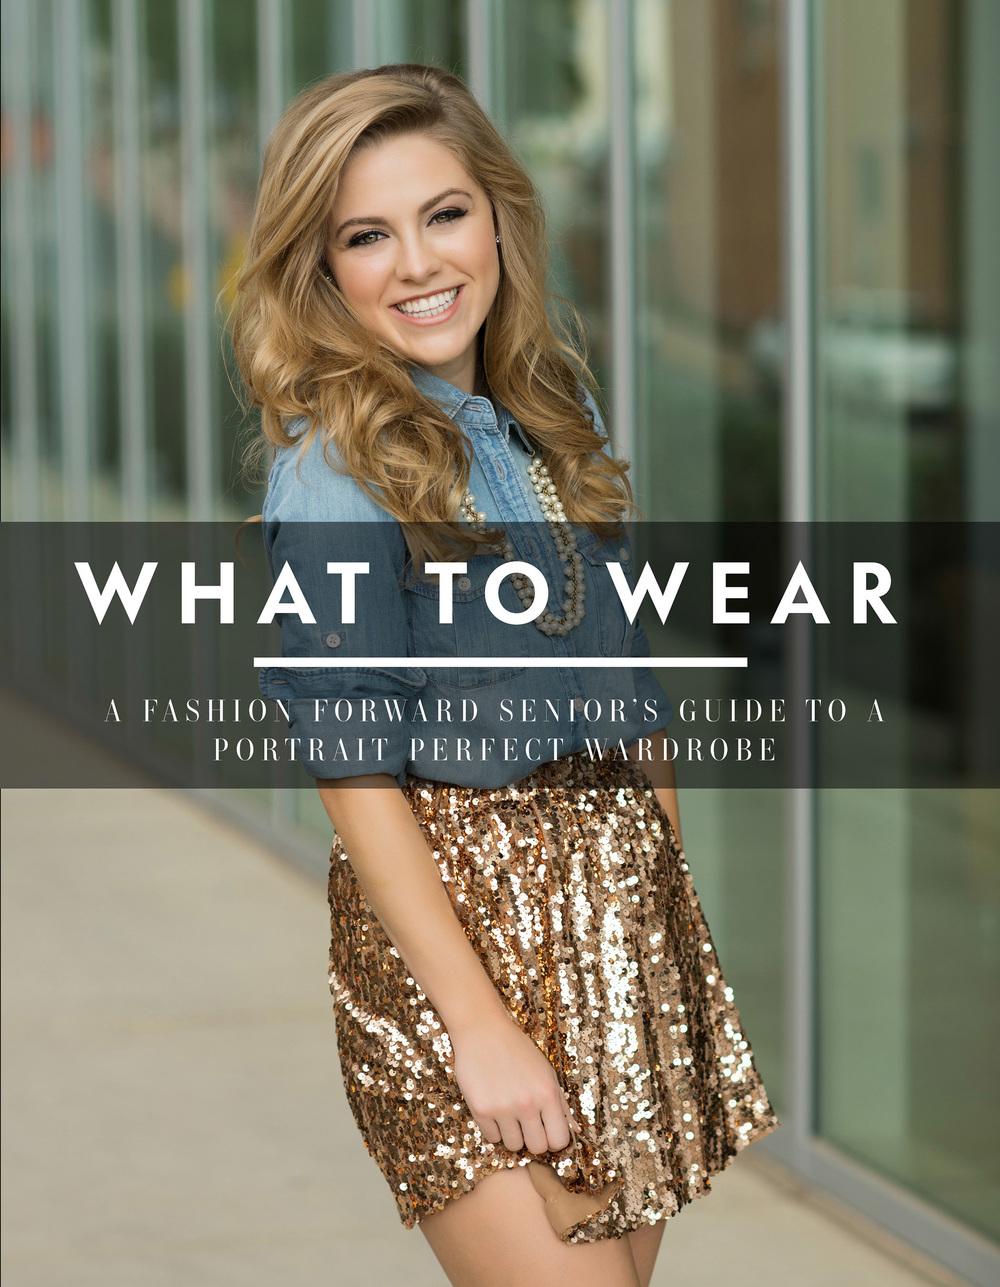 What to Wear Guide - Digital PDF-1-Left.jpg